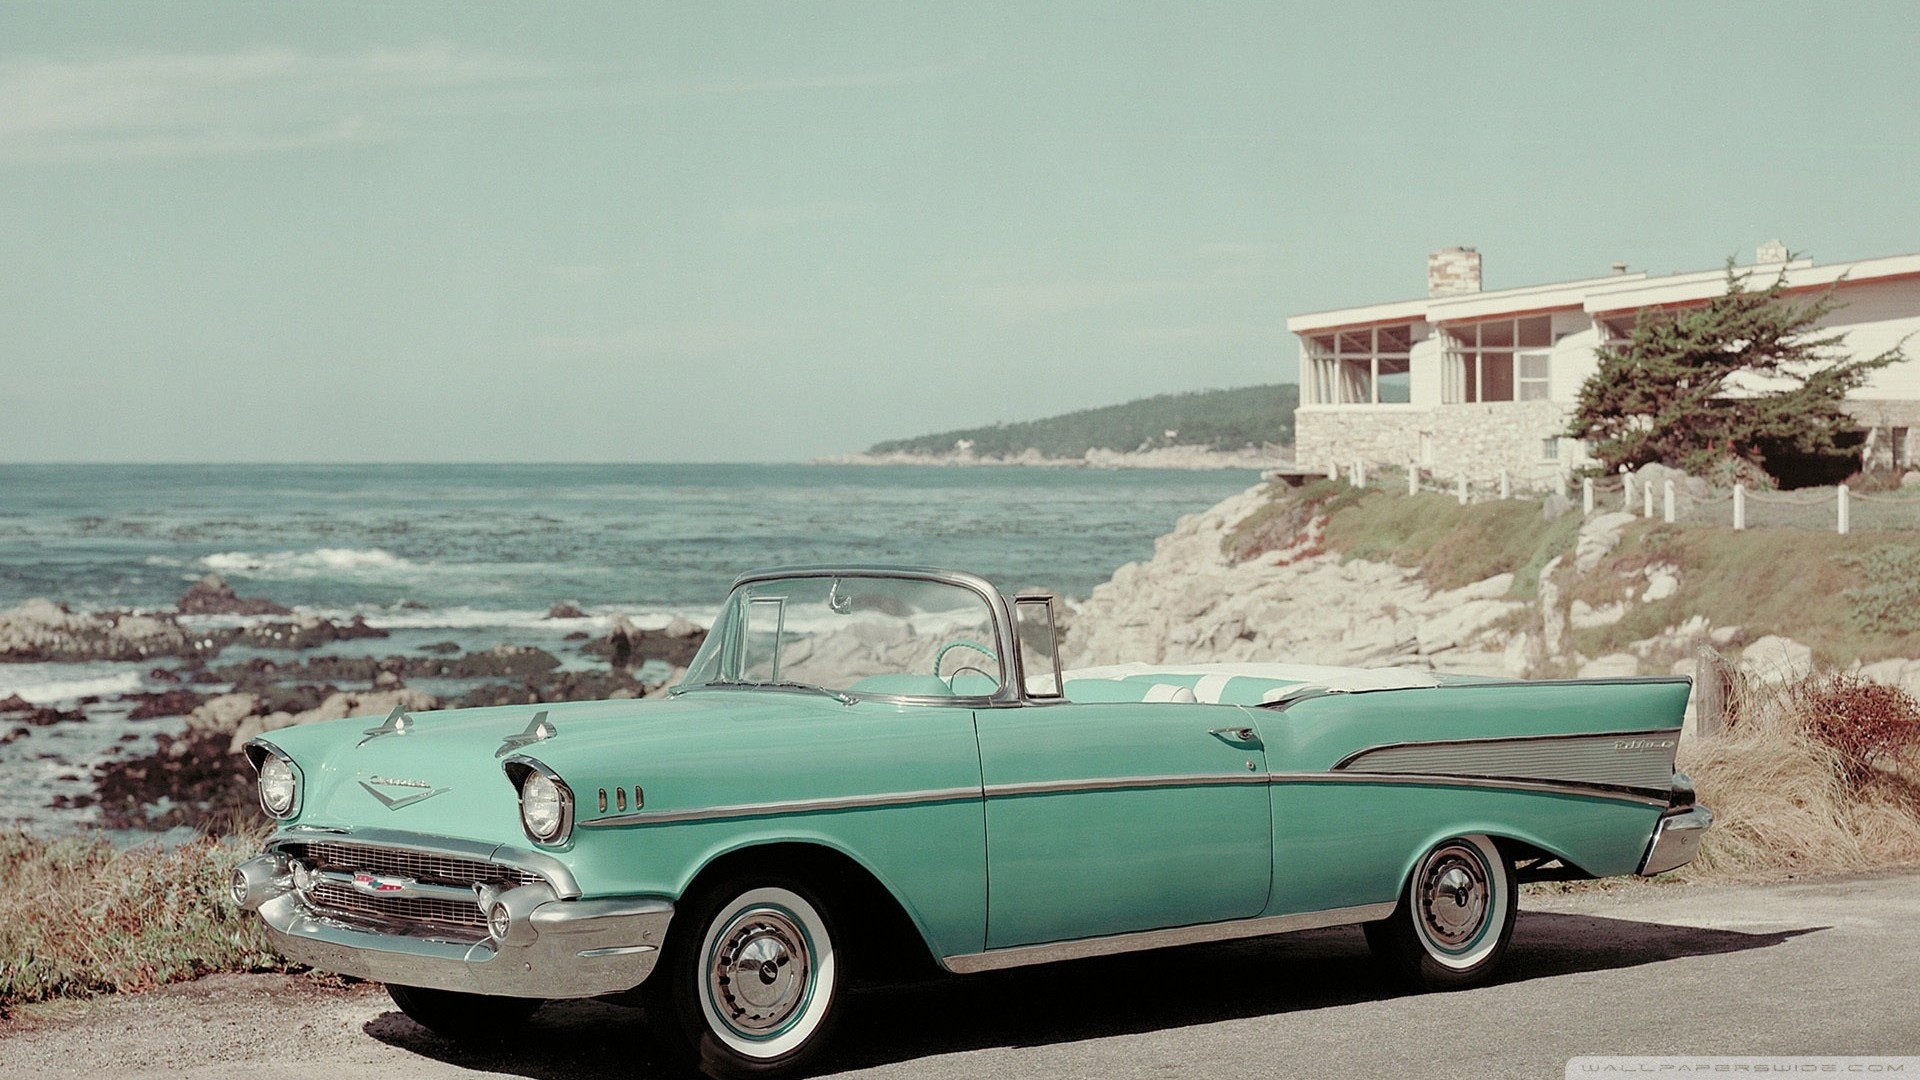 57 Chevy Wallpaper 1957 Chevrolet El Camino Ss 2764x1843 Phantom